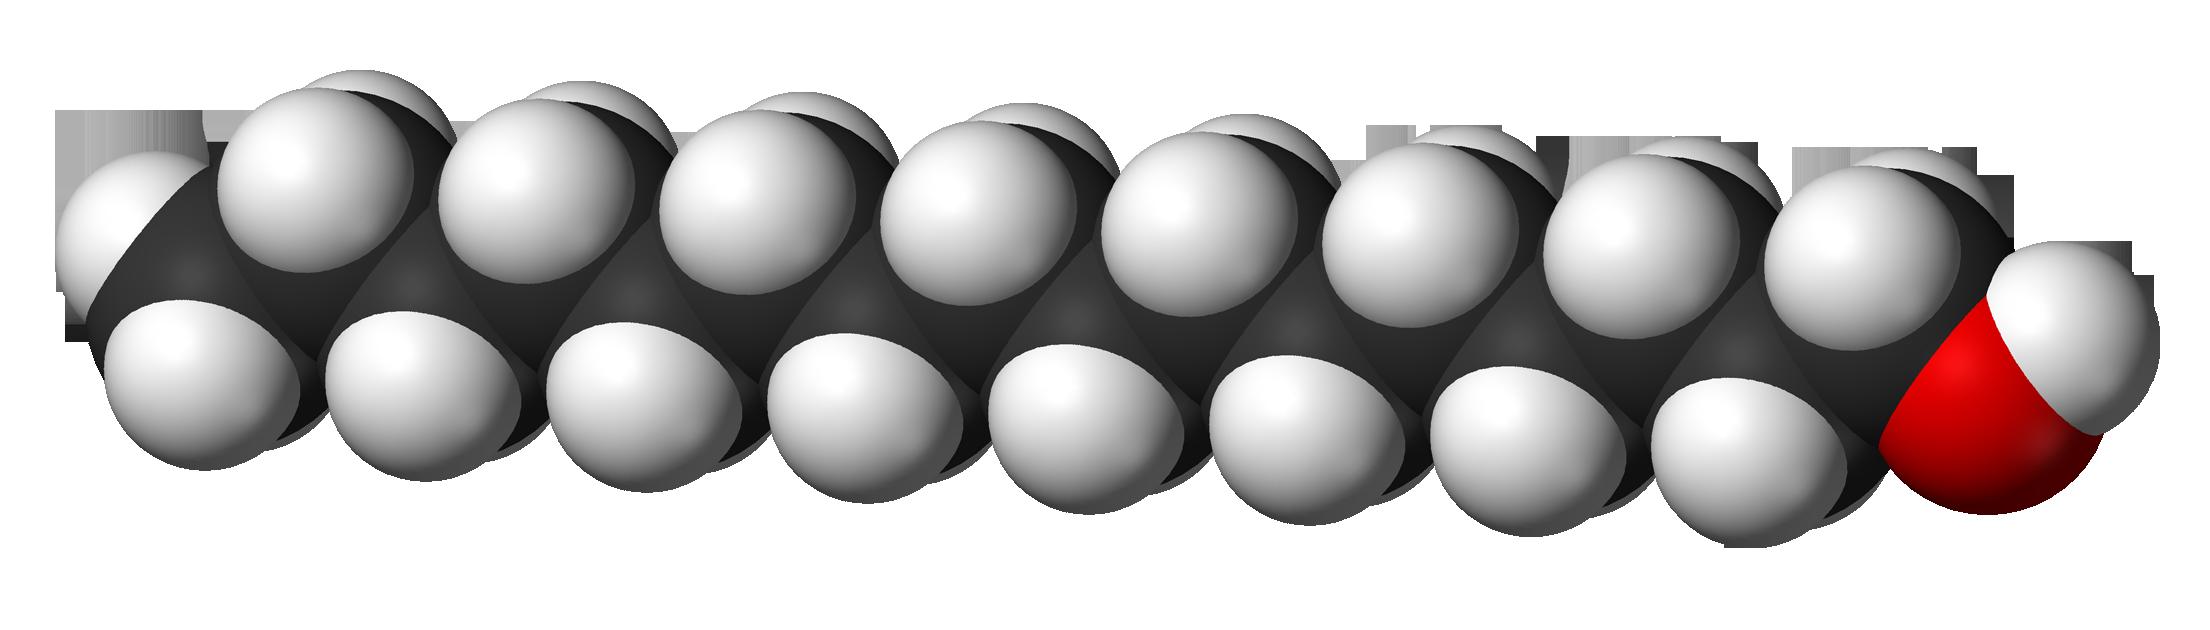 Chem103csu Cetyl Alcohol